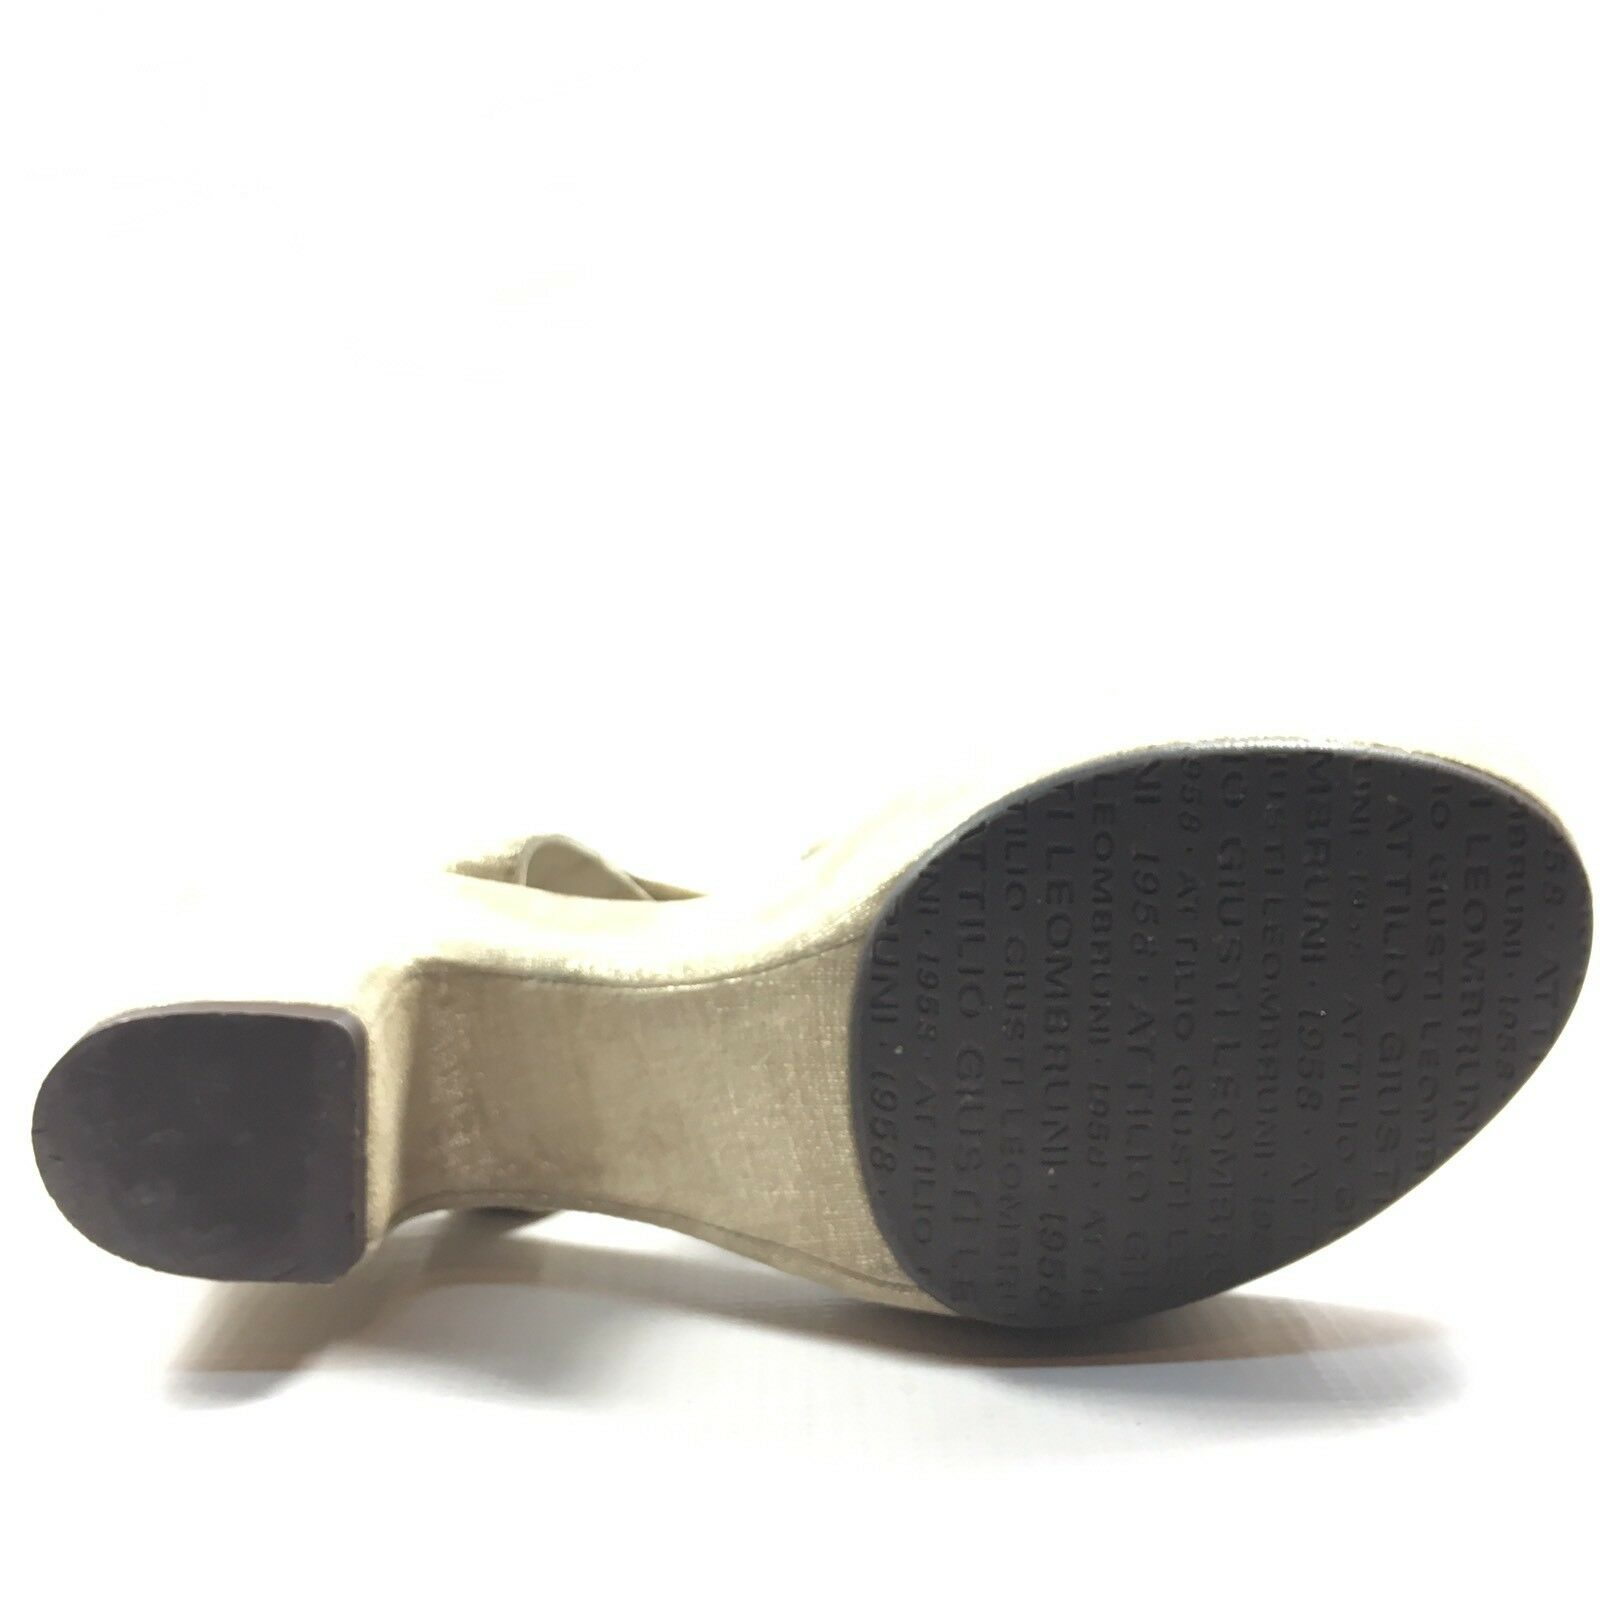 AGL Attilio Giusti Leombruni Leombruni Leombruni Platform Taupe Wedge Sandals Women's Size 38.5 M 64f93d